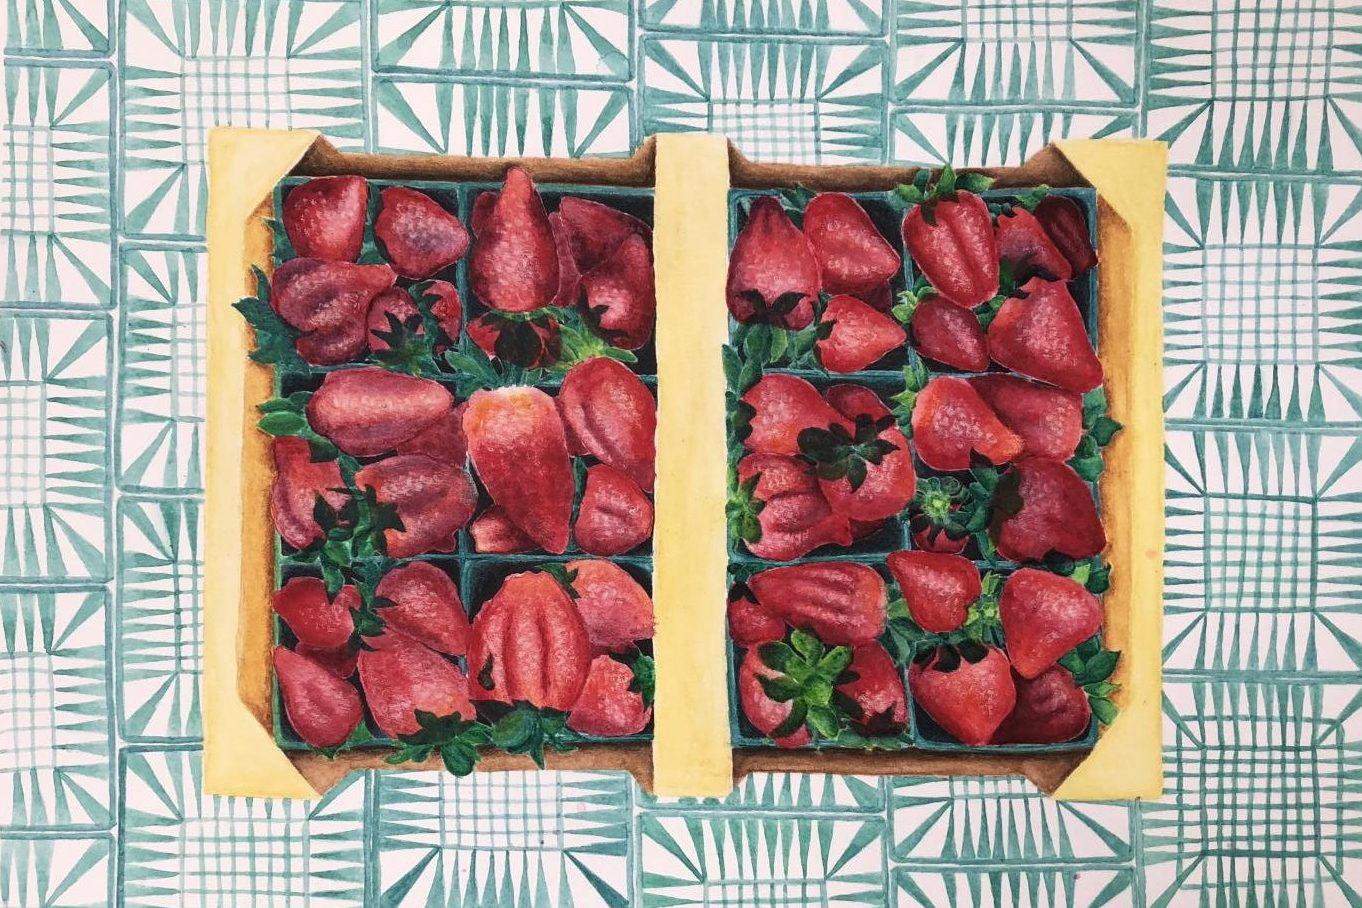 This painting of strawberries is part of Bella Epstein '19's AP Studio Art portfolio